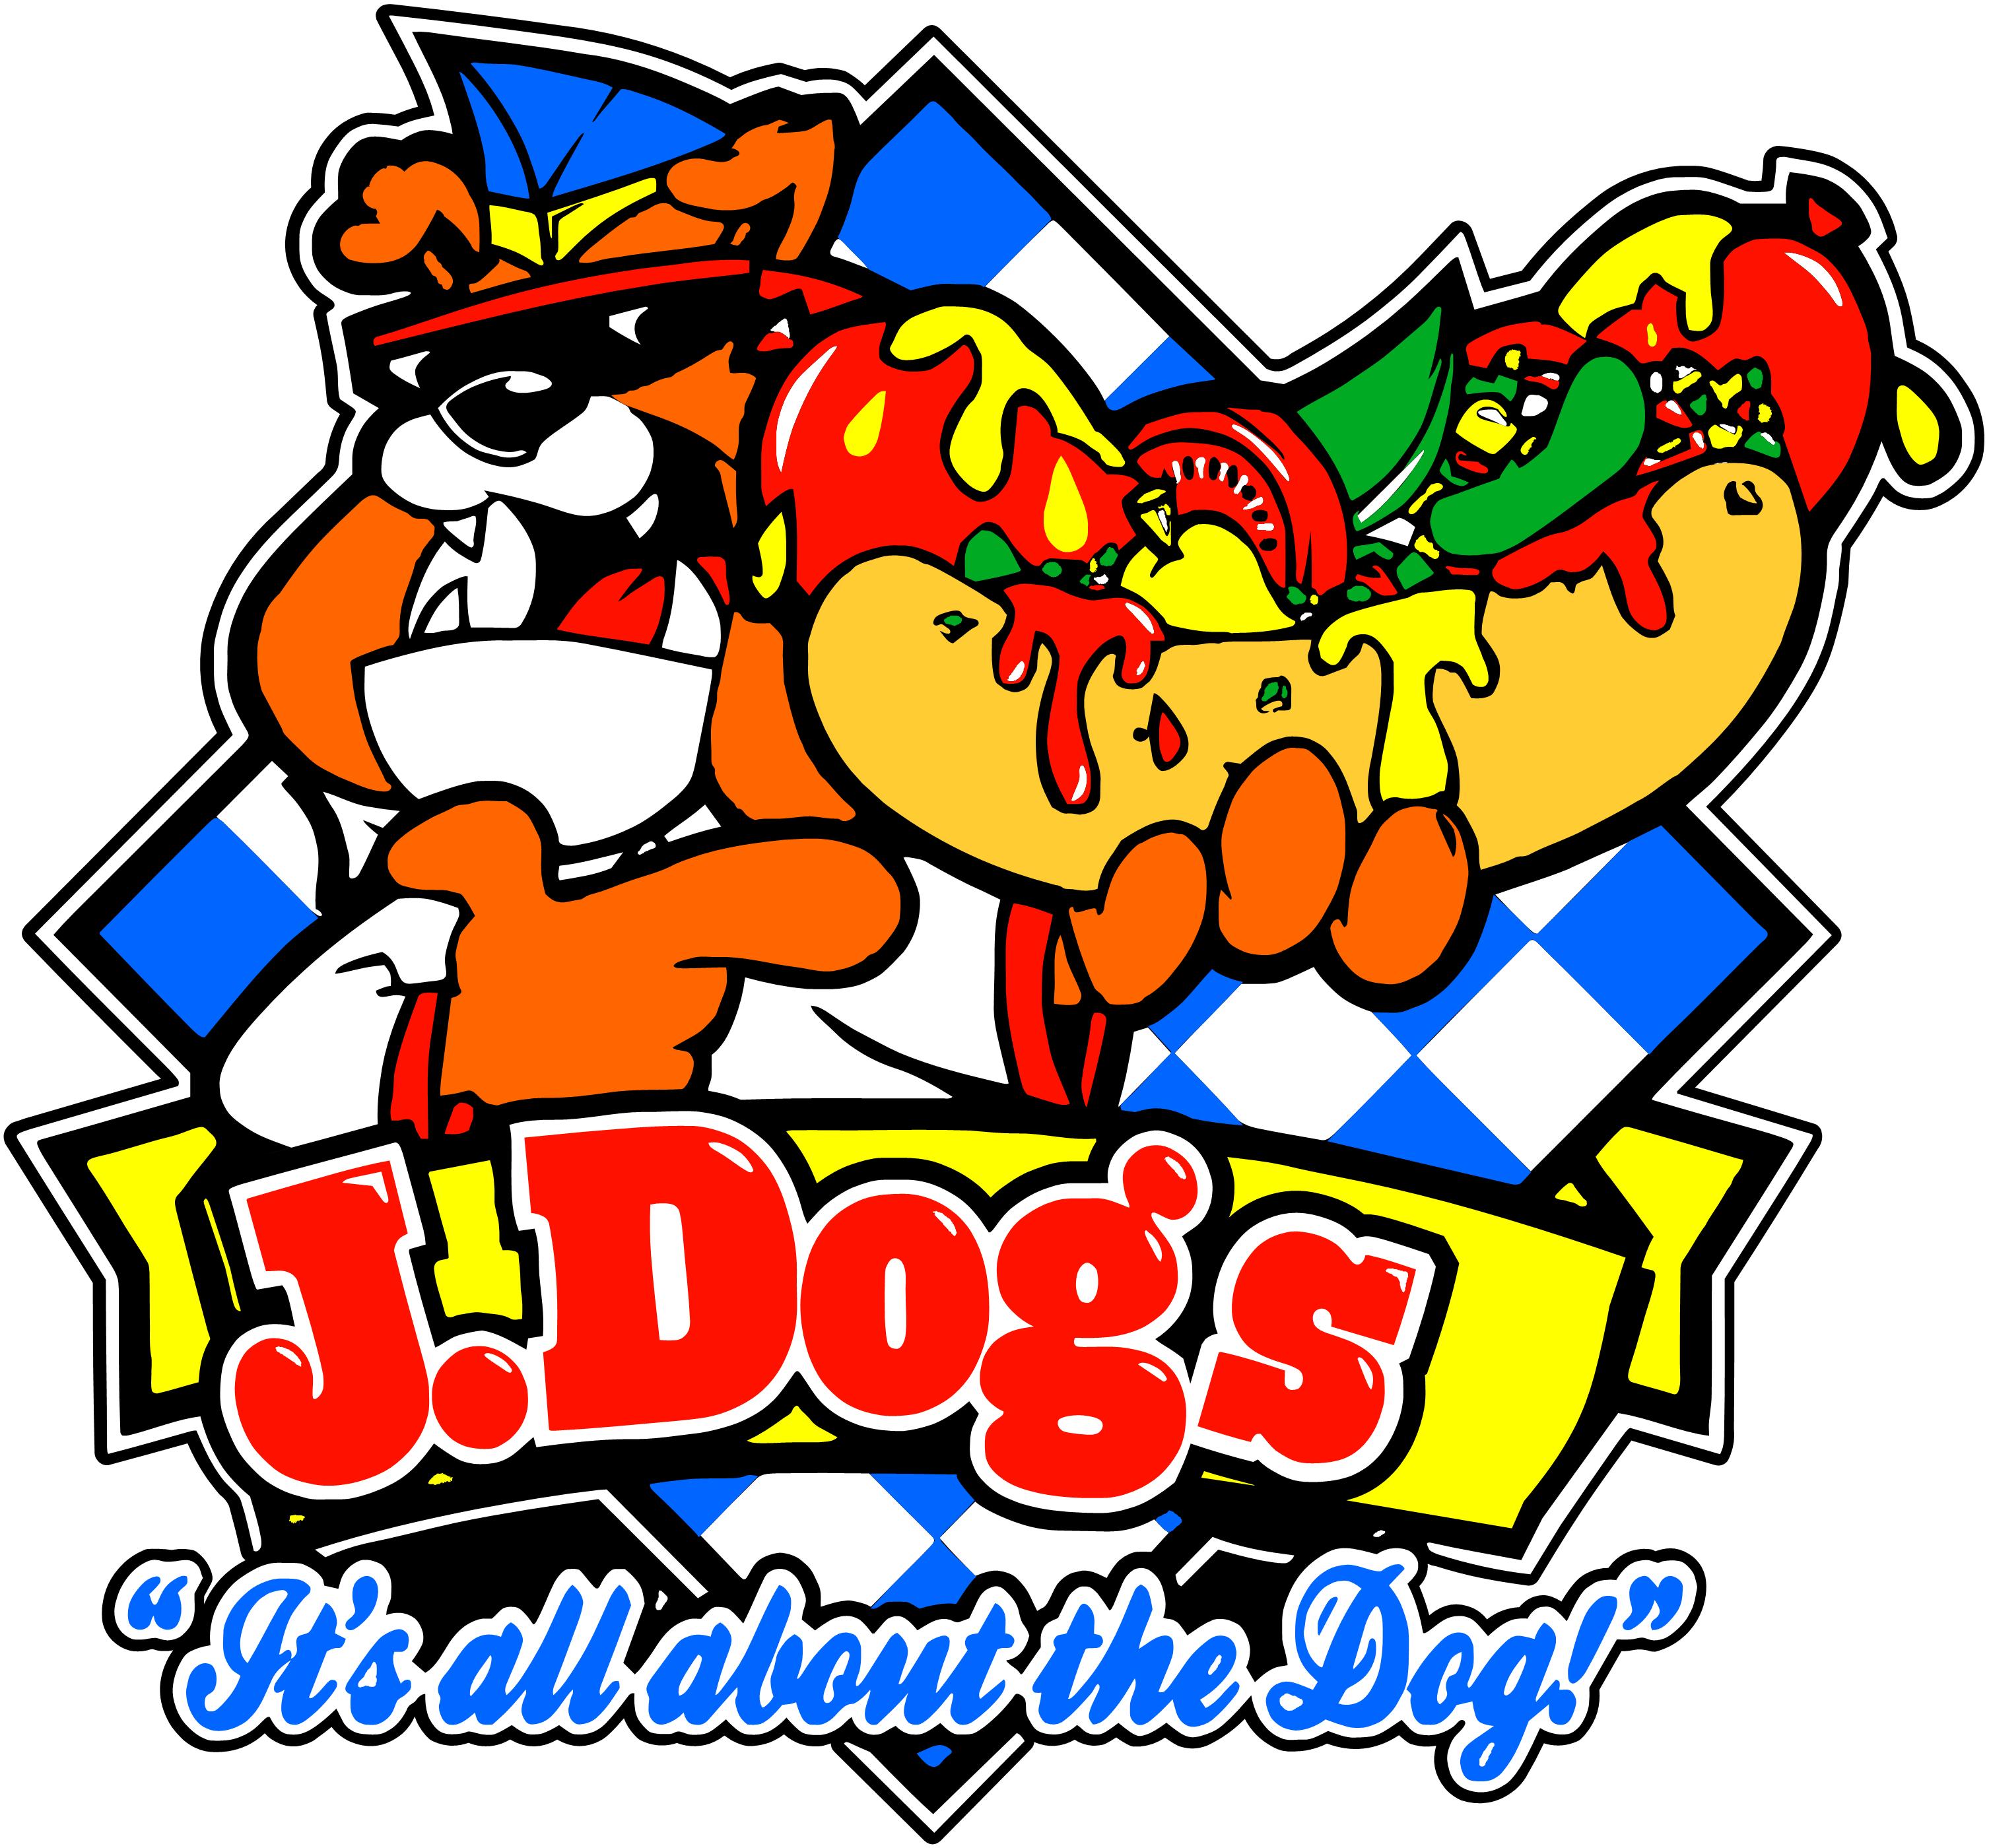 J.Dogs